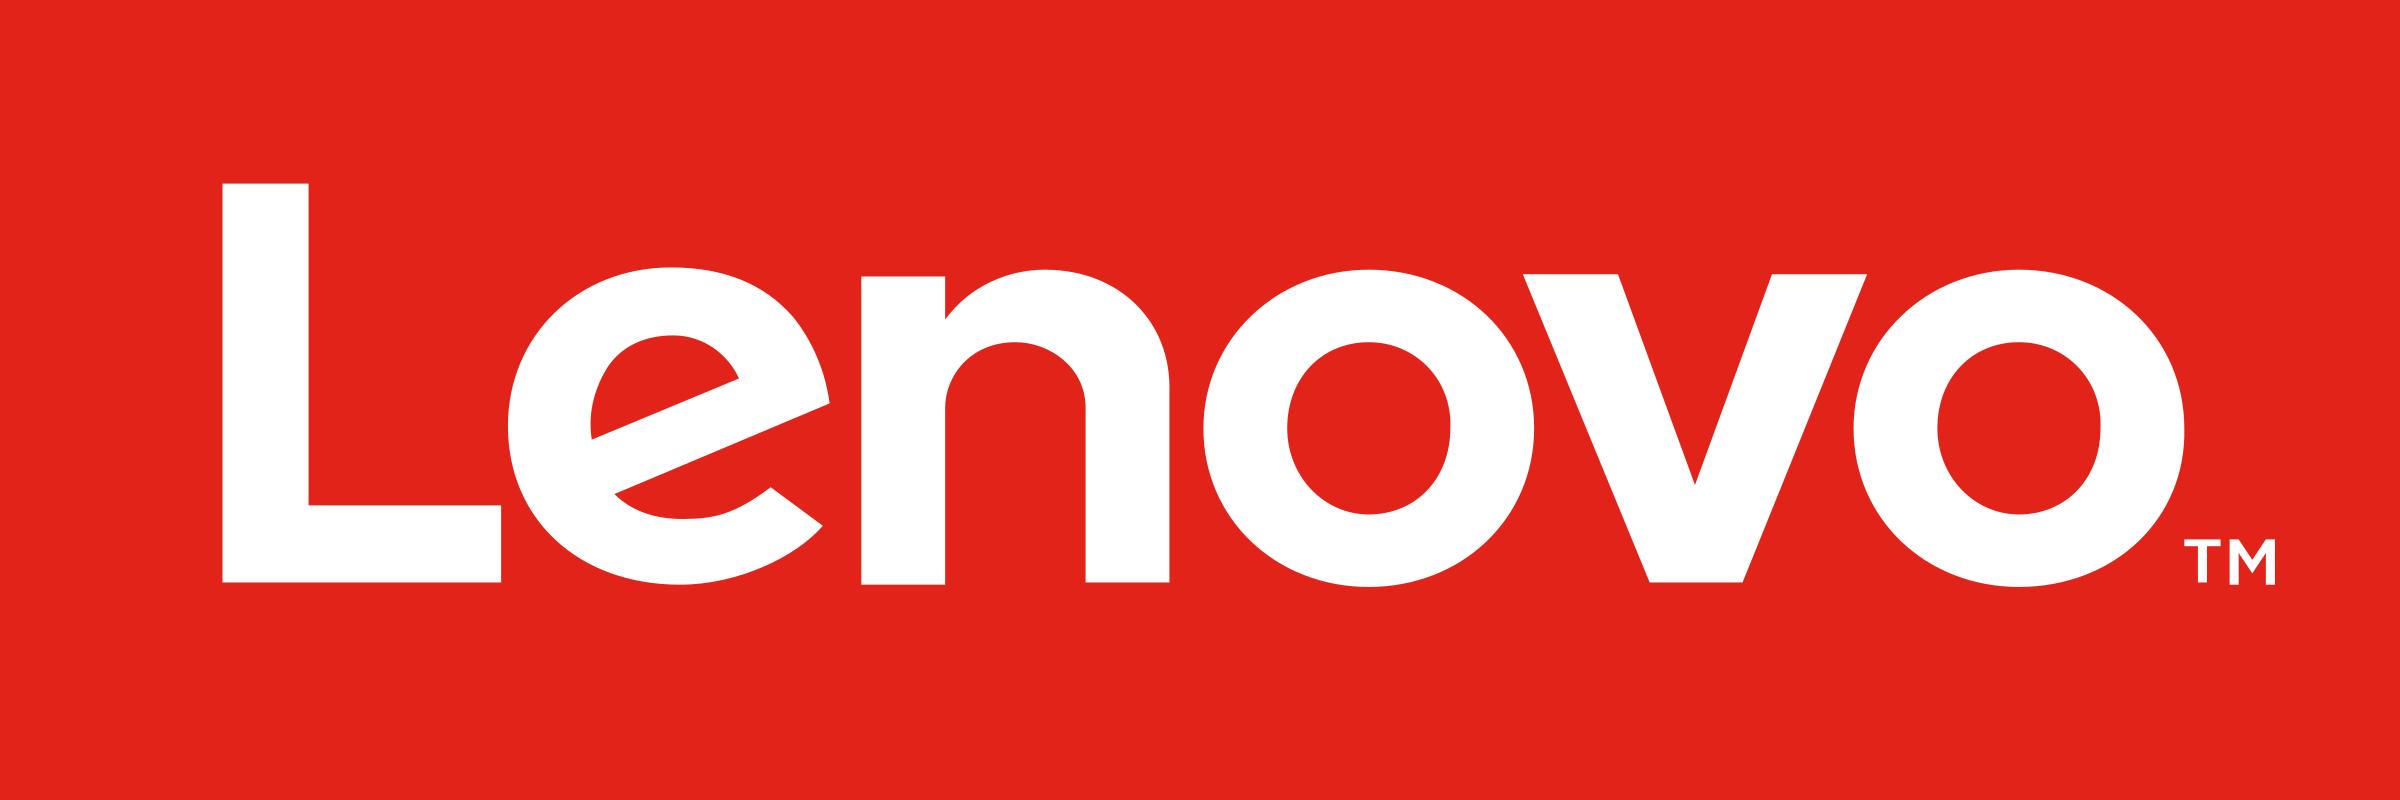 LENOVO SERVICE CENTER IN CHENNAI | LENOVO LAPTOP | LENOVO MOBILE | LENOVO TABLET